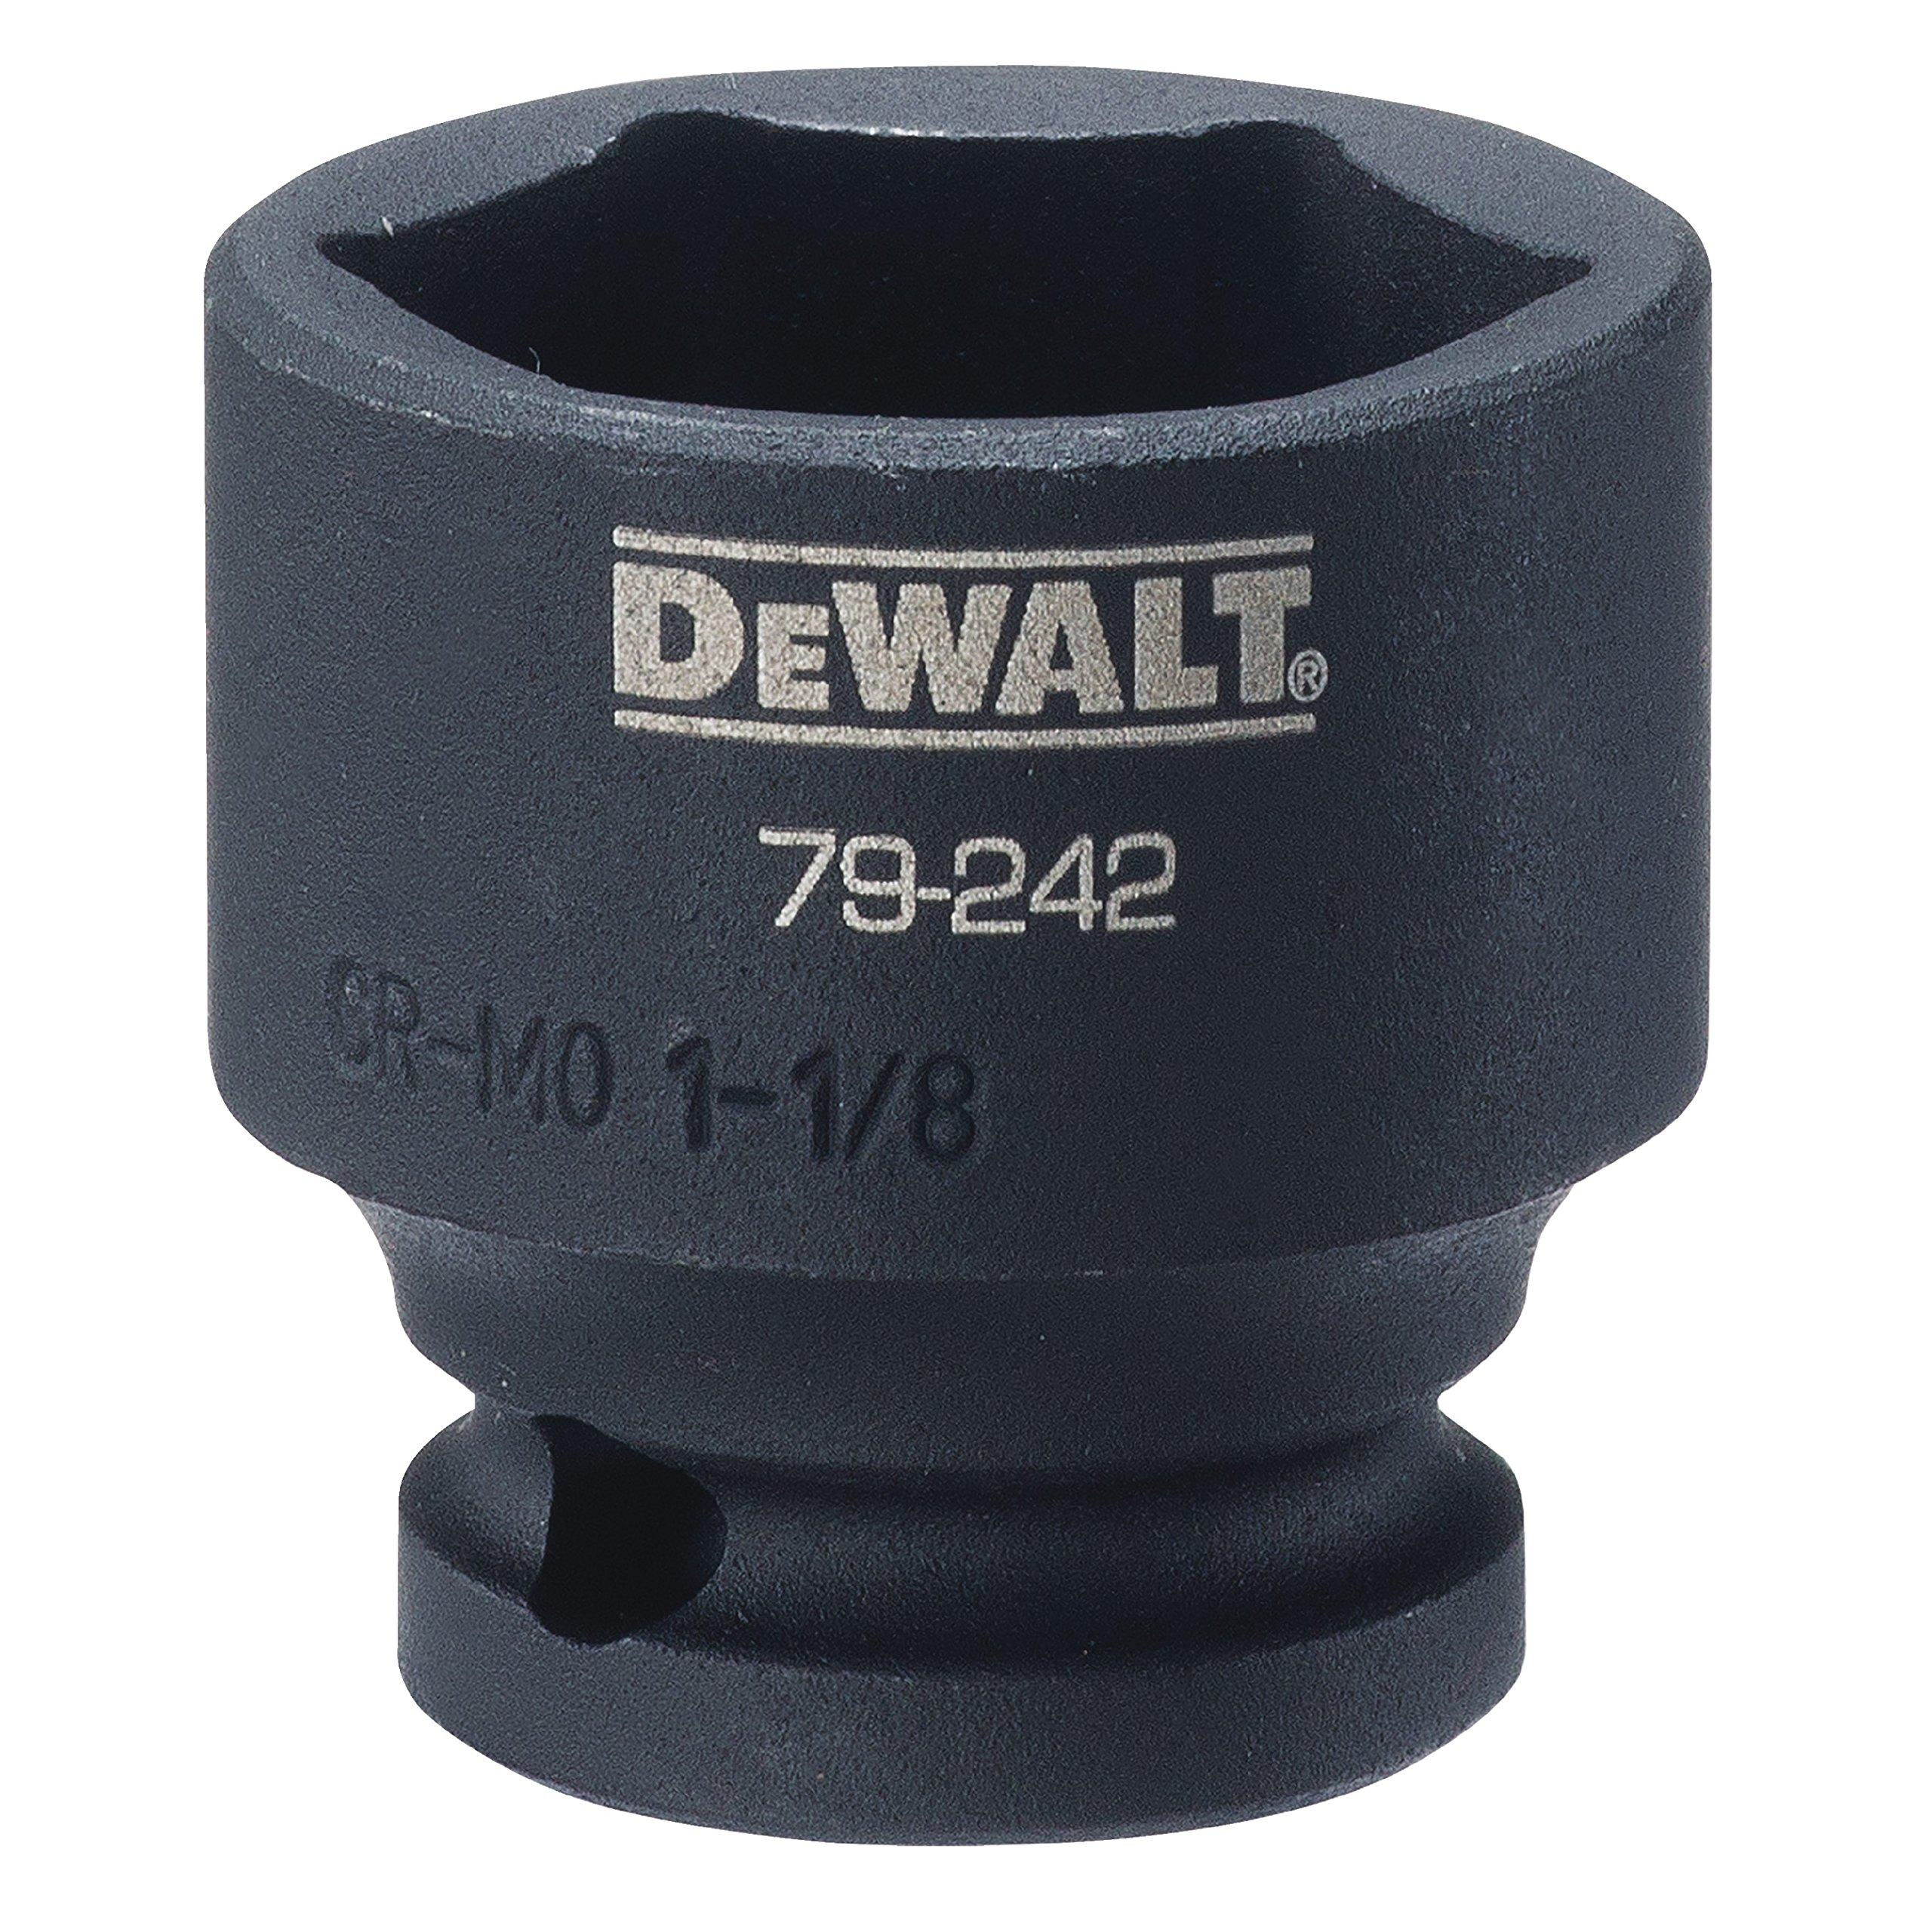 DEWALT 6 PT 1/2'' Drive Impact Socket 1-1/8IN SAE